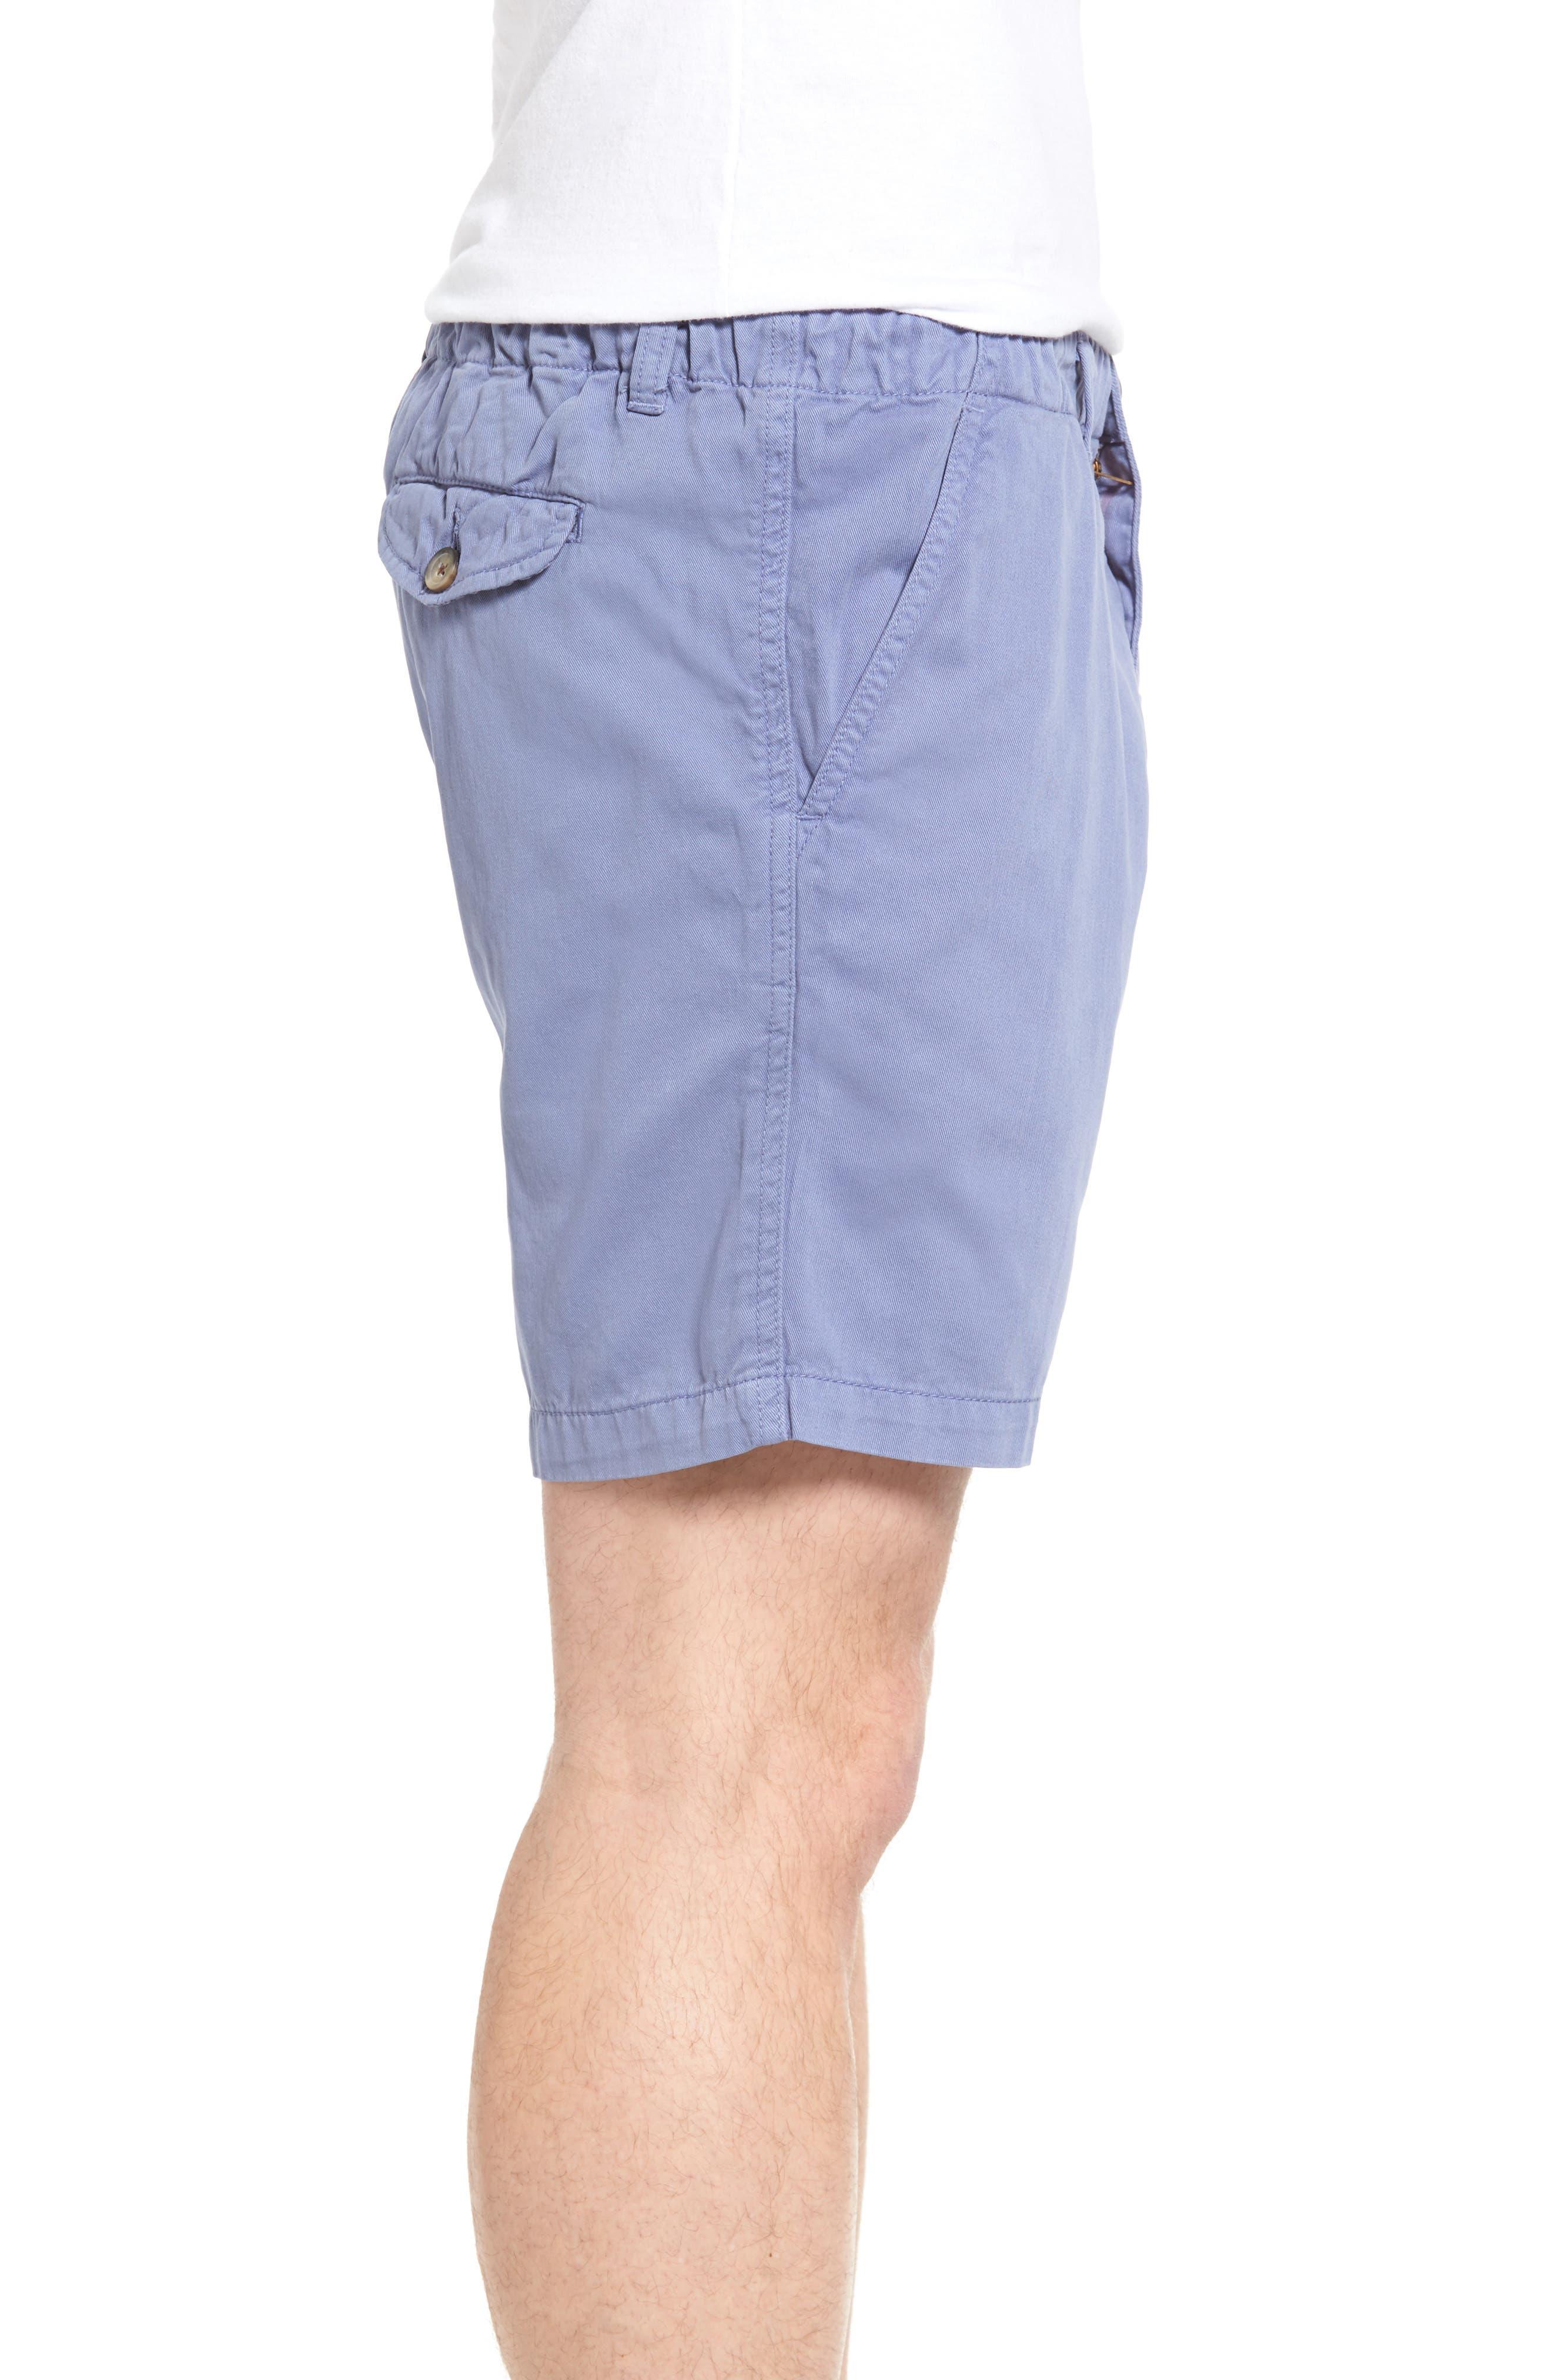 Washed Shorts,                             Alternate thumbnail 17, color,